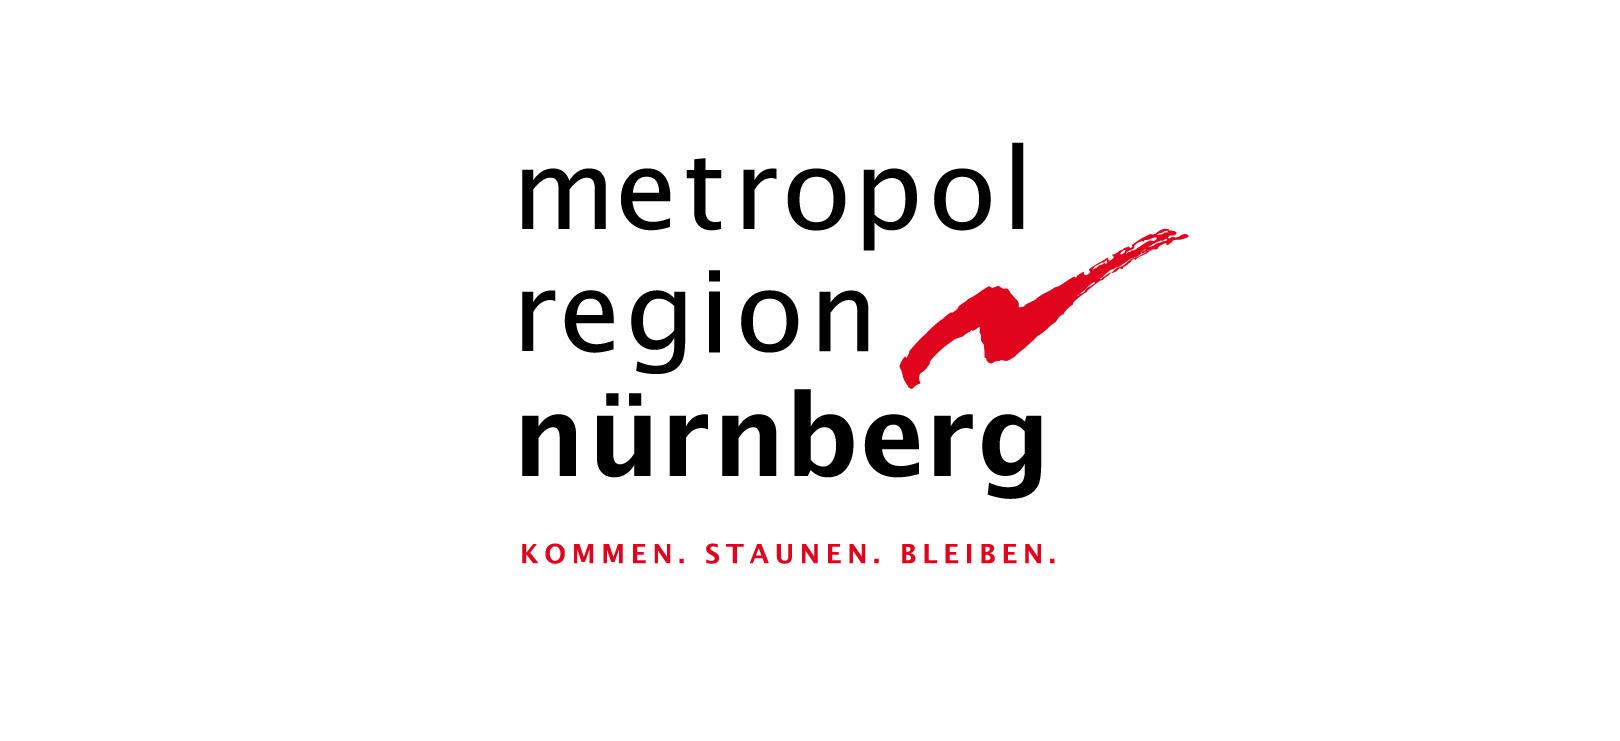 RenéRosa / Metropolregion